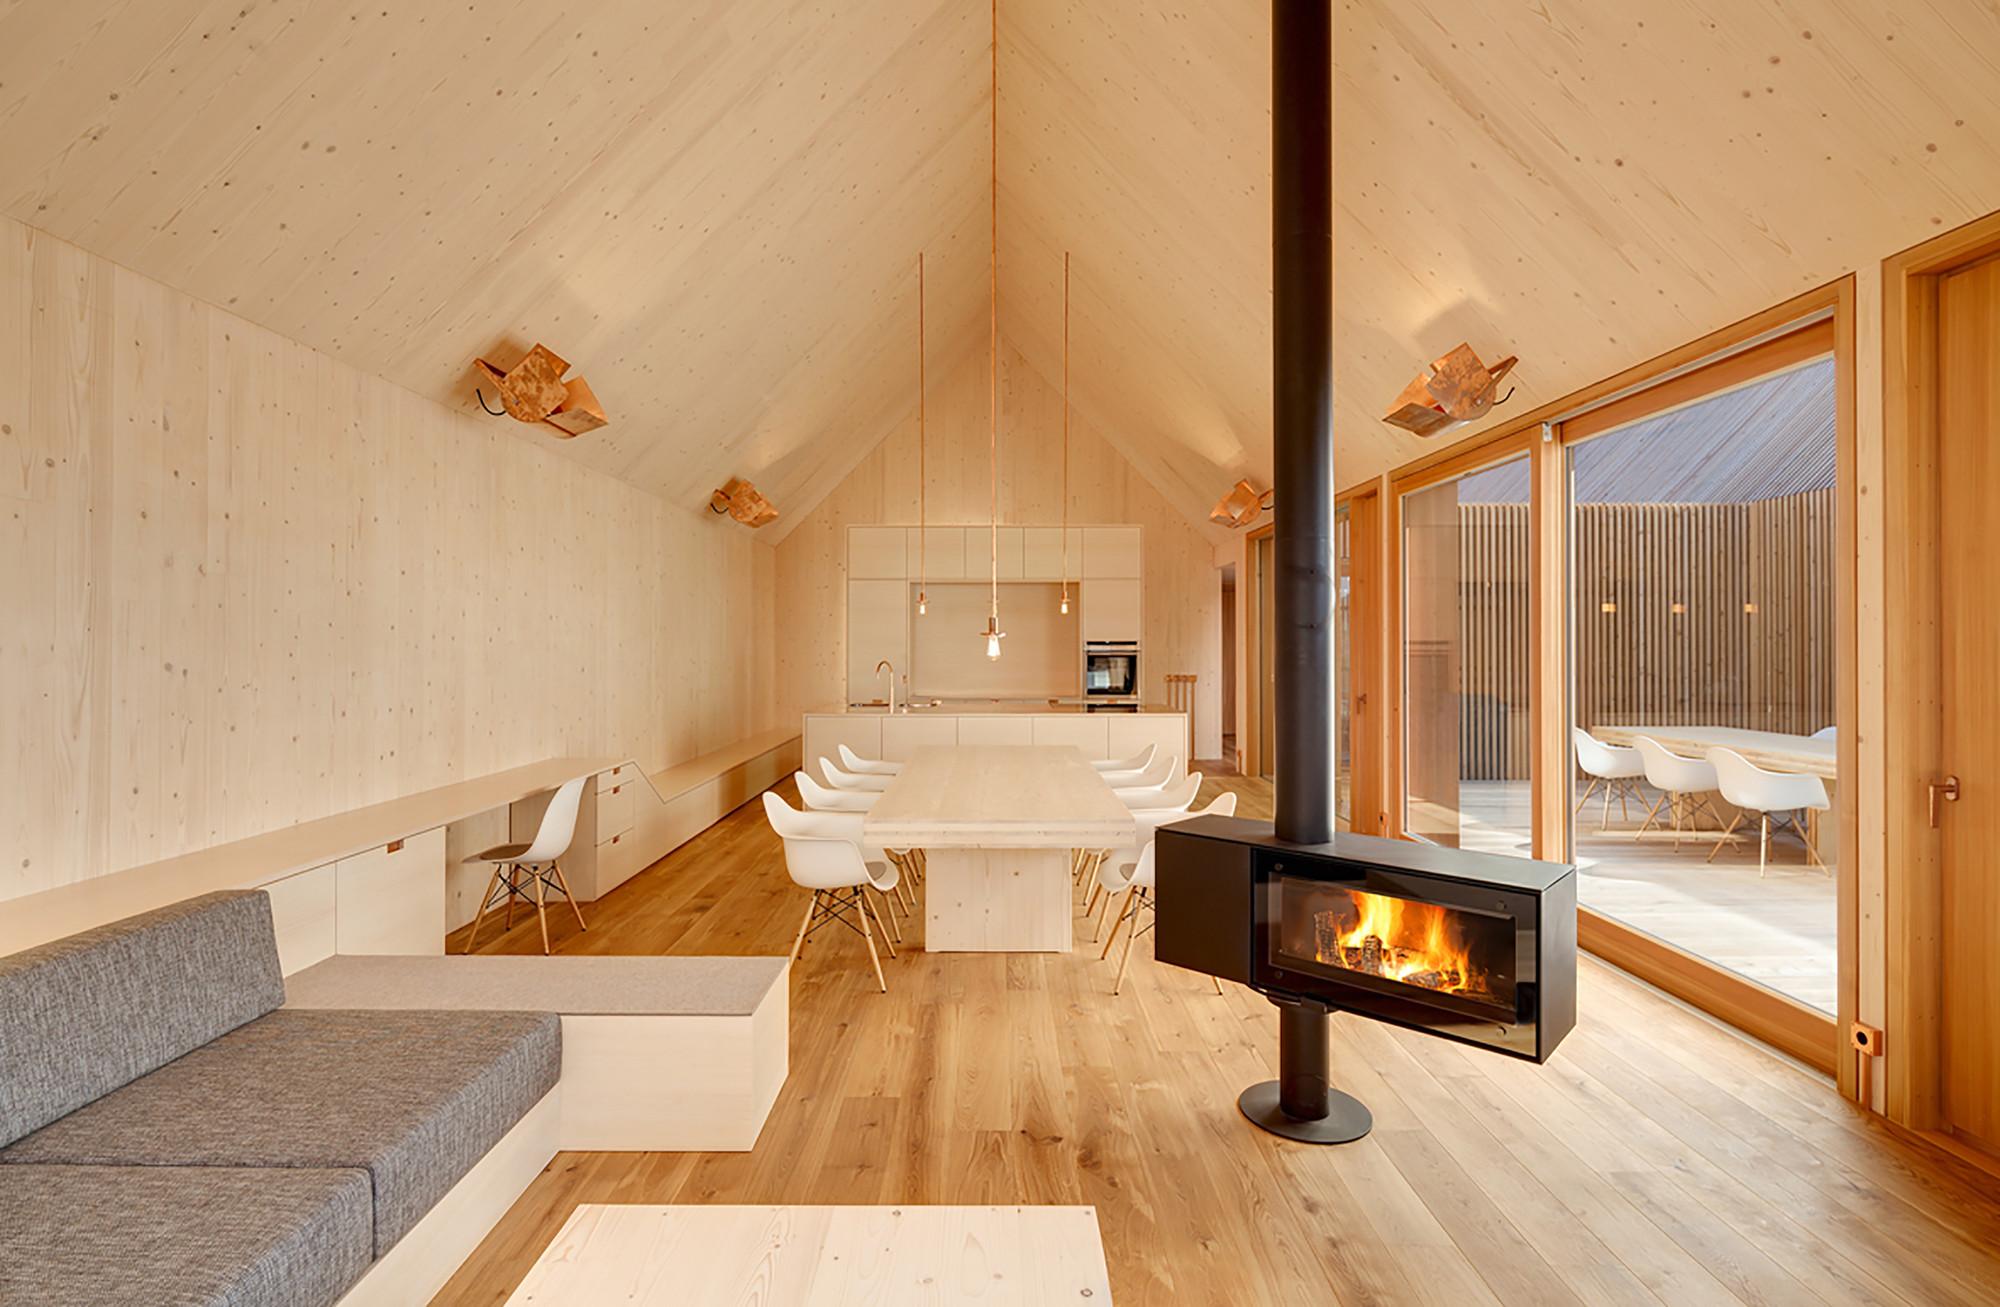 Galeria de Casa de Madeira  KHNLEIN Architektur  3